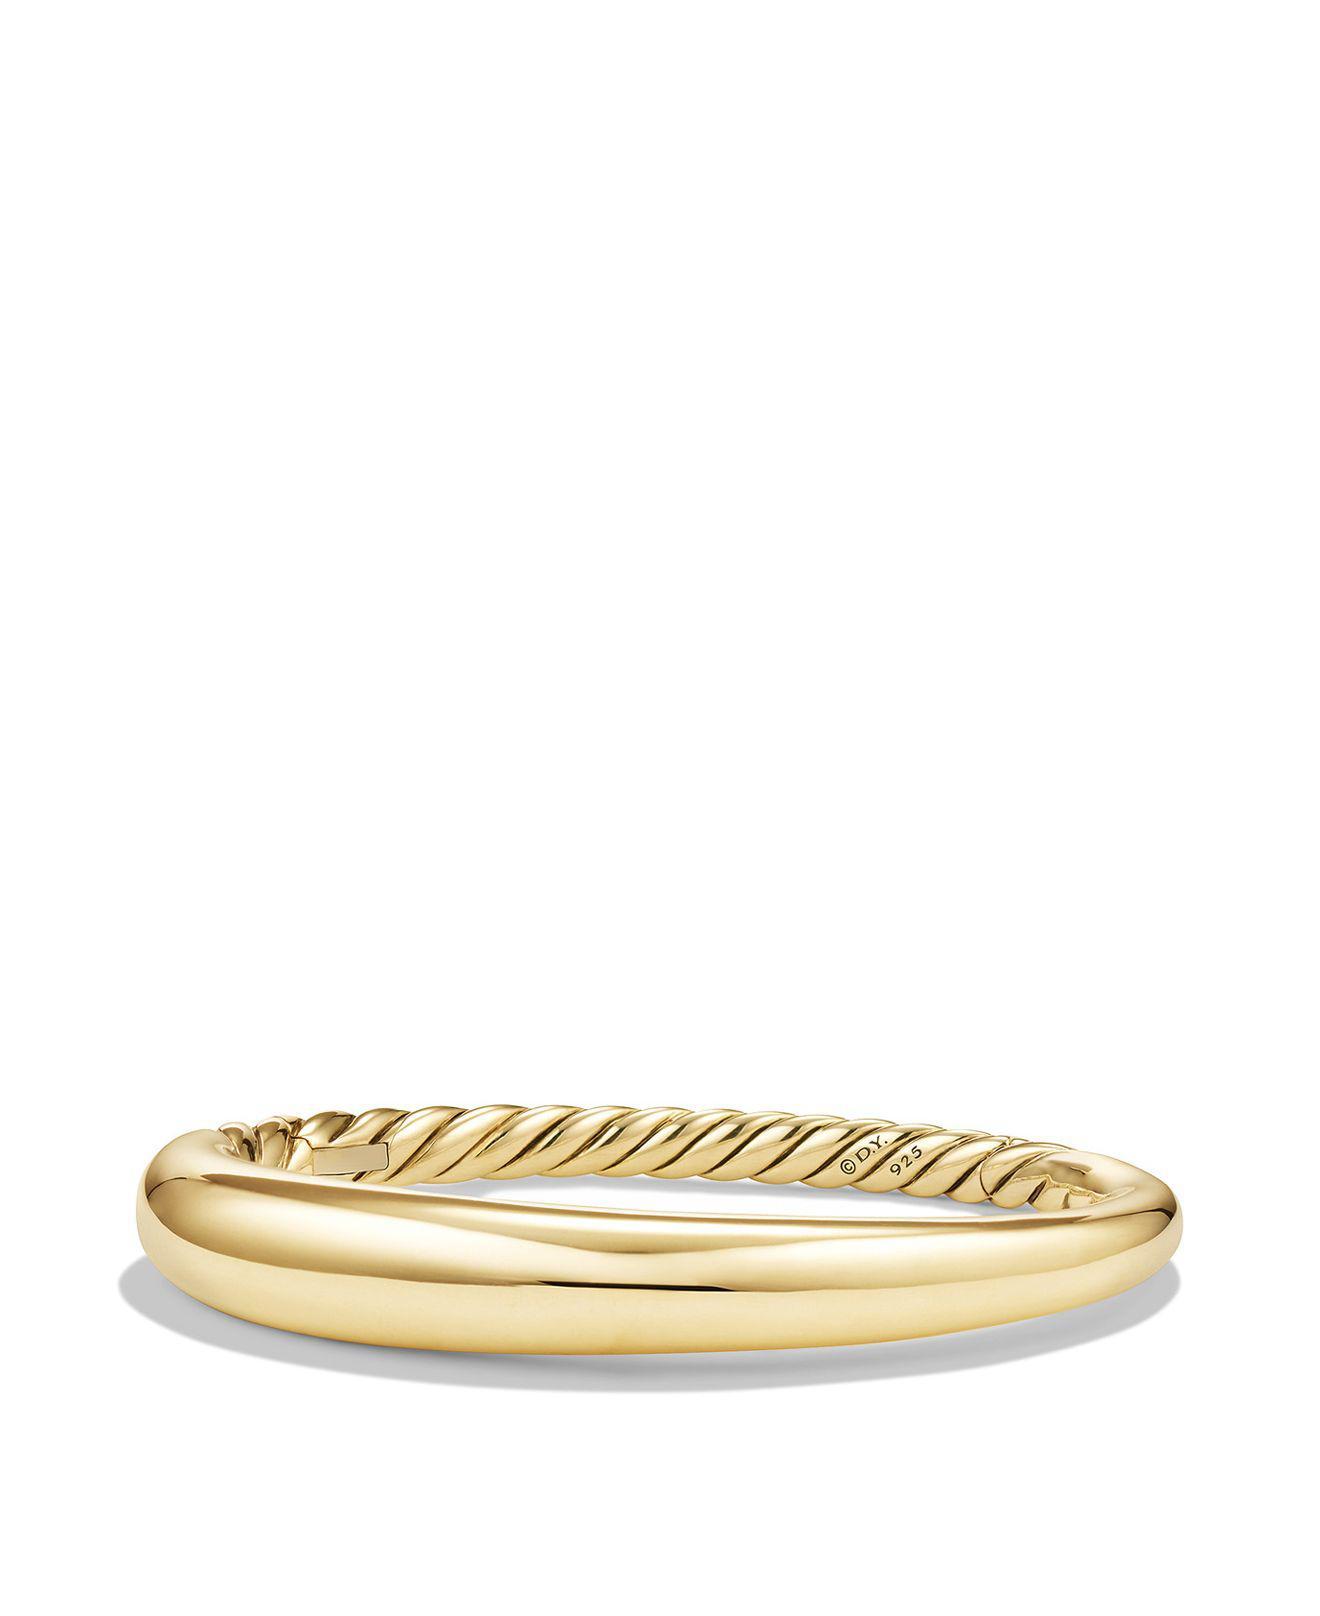 David Yurman Pure Form smooth diamond bangle - Metallic uDMnY